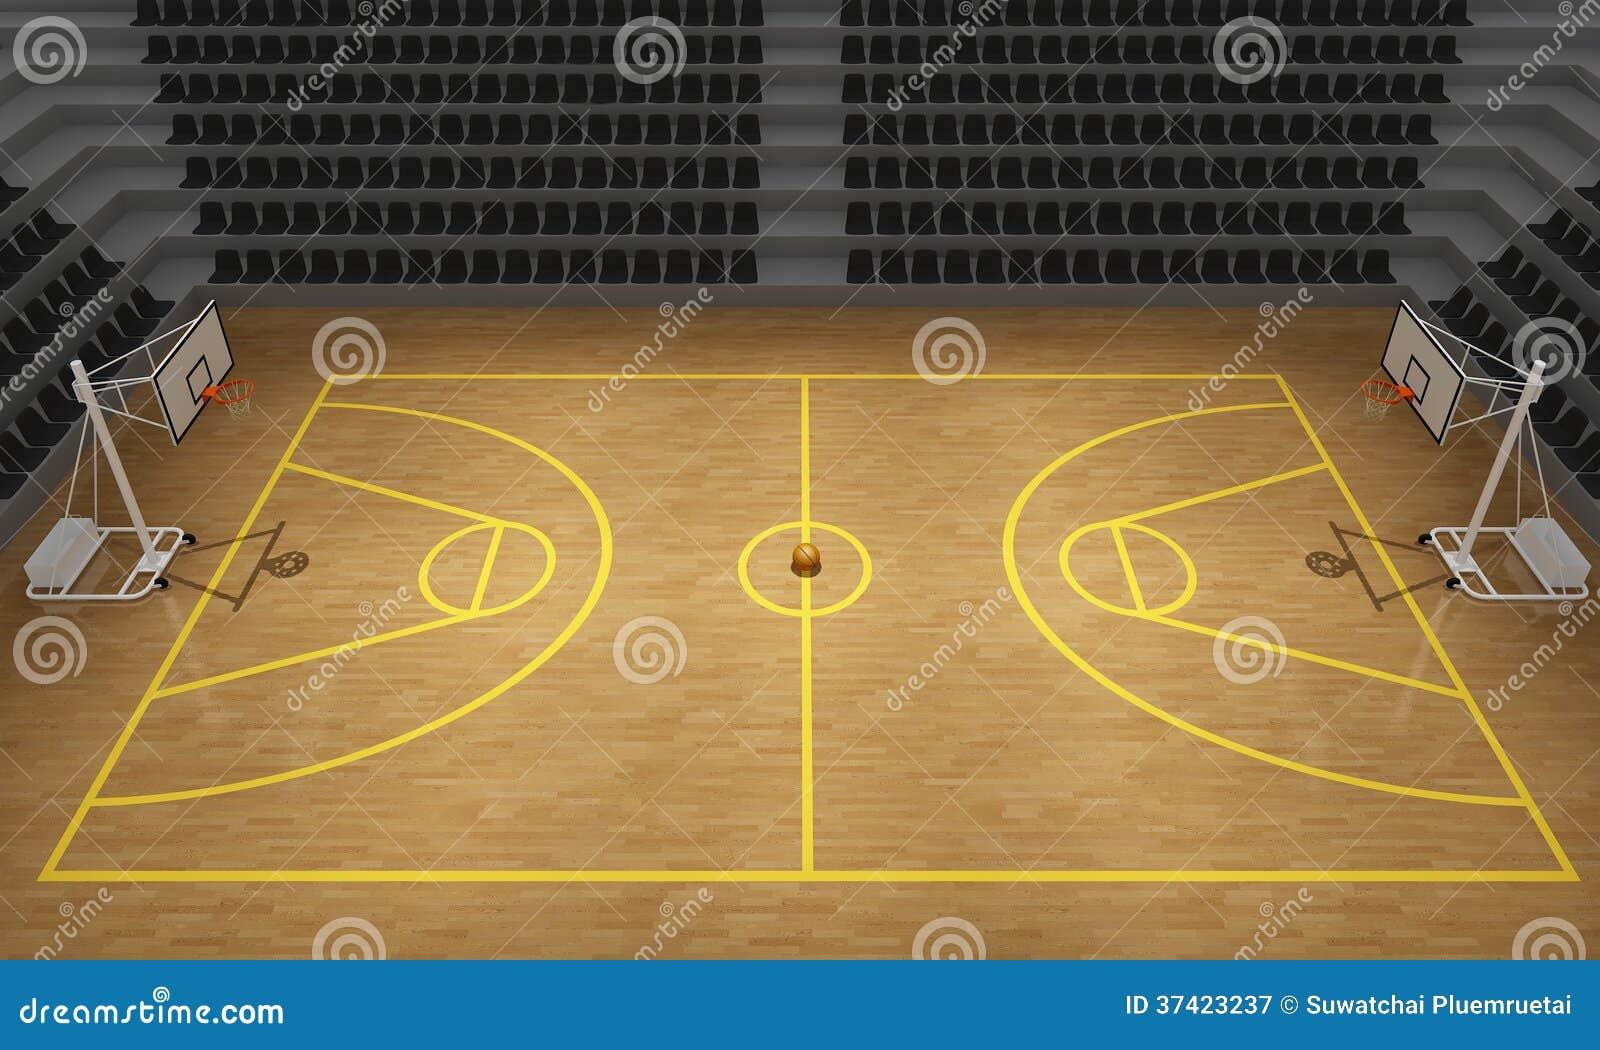 Basketball Stadium 3d Royalty Free Stock Photography